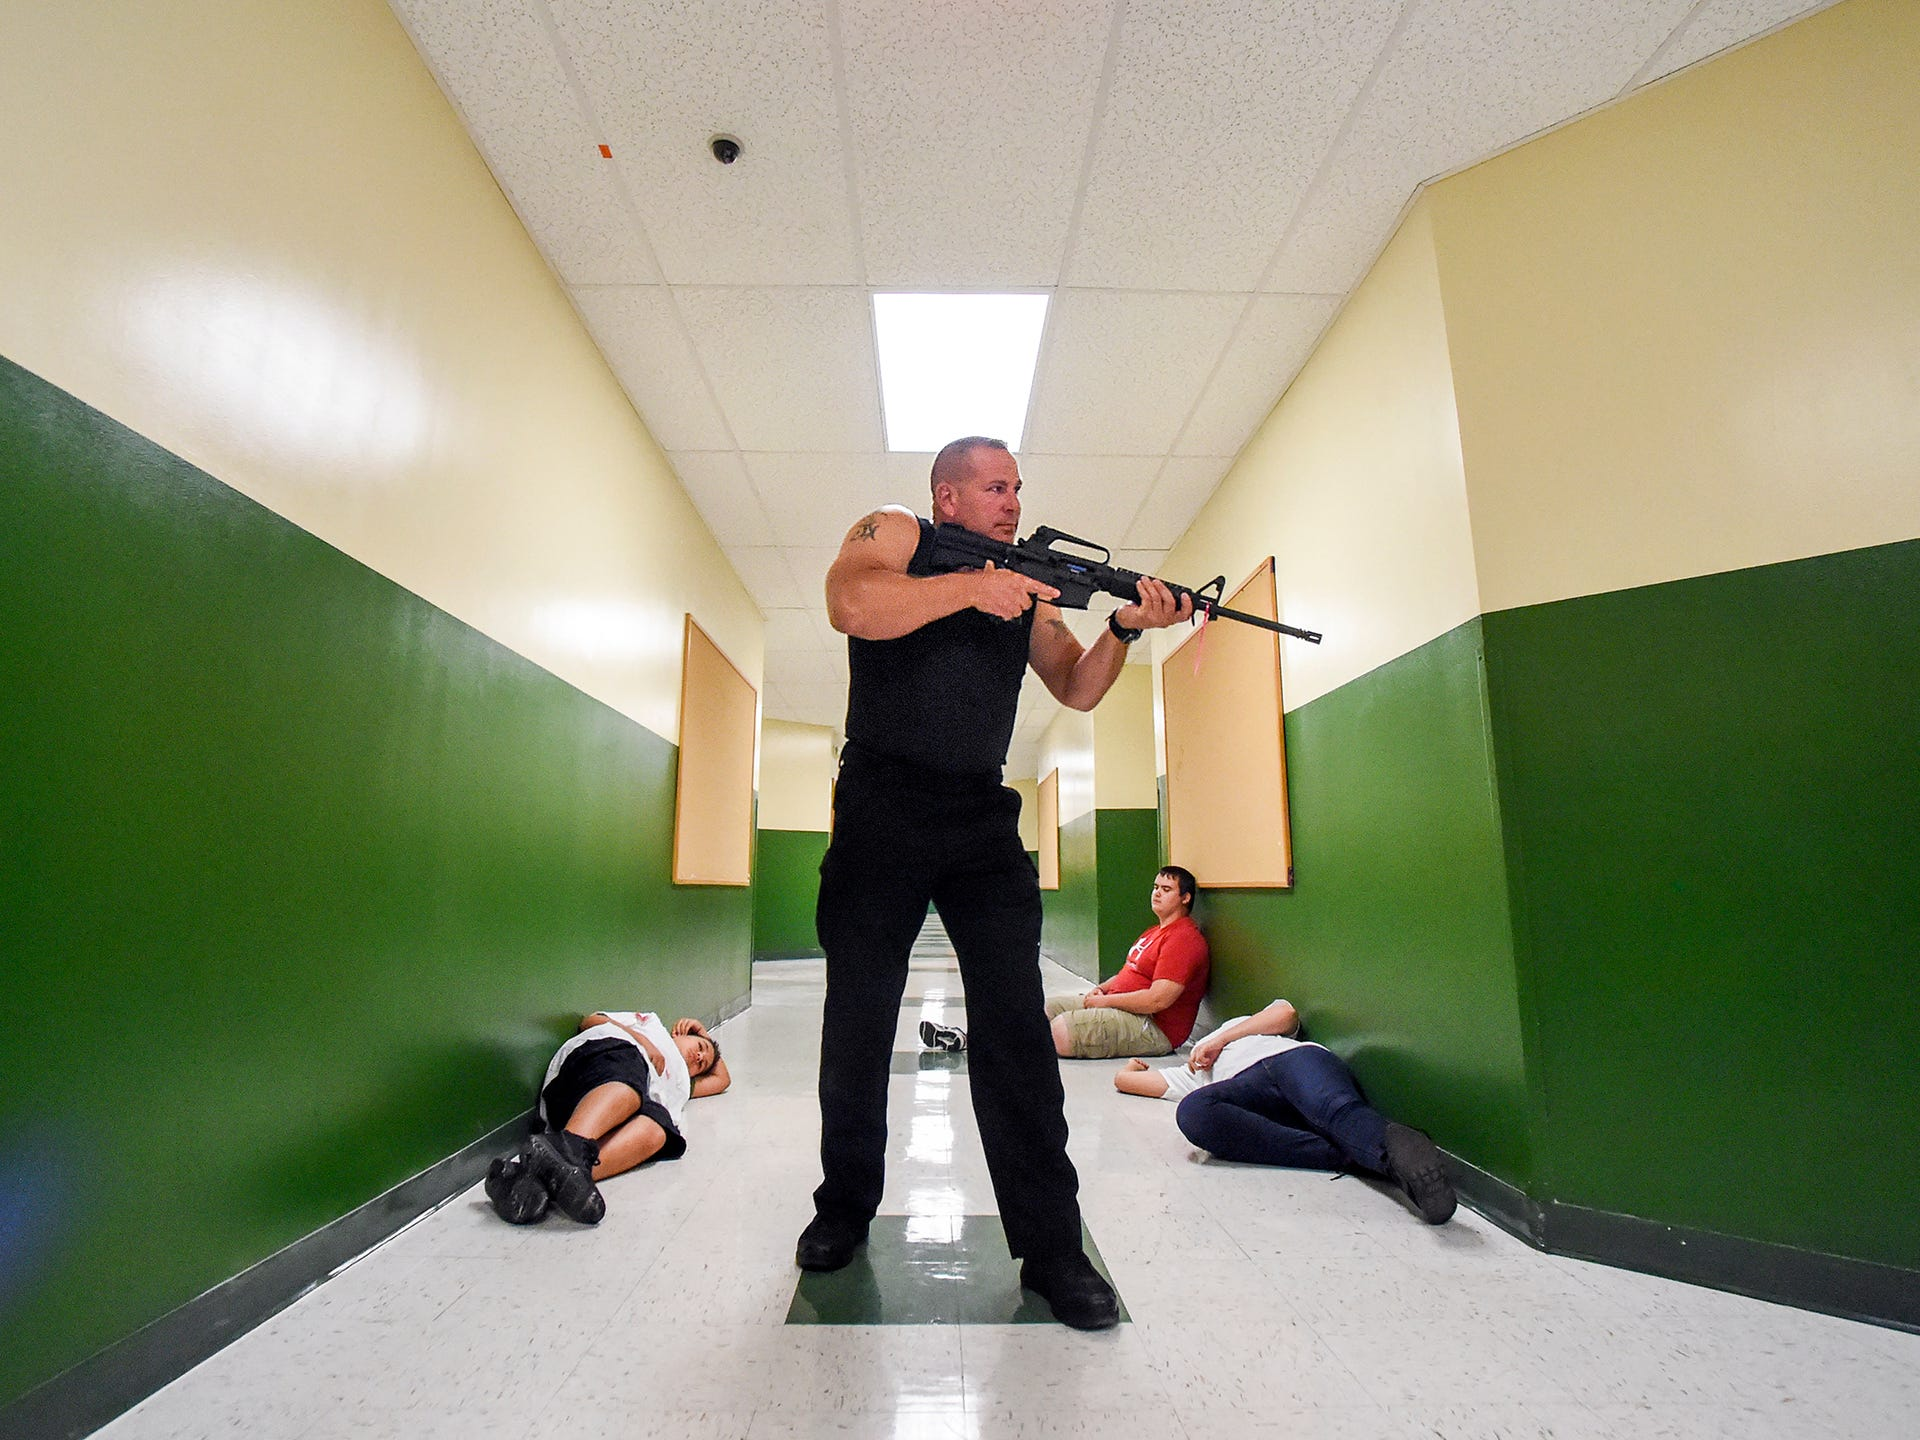 PSL police conduct active threat drills at Renaissance